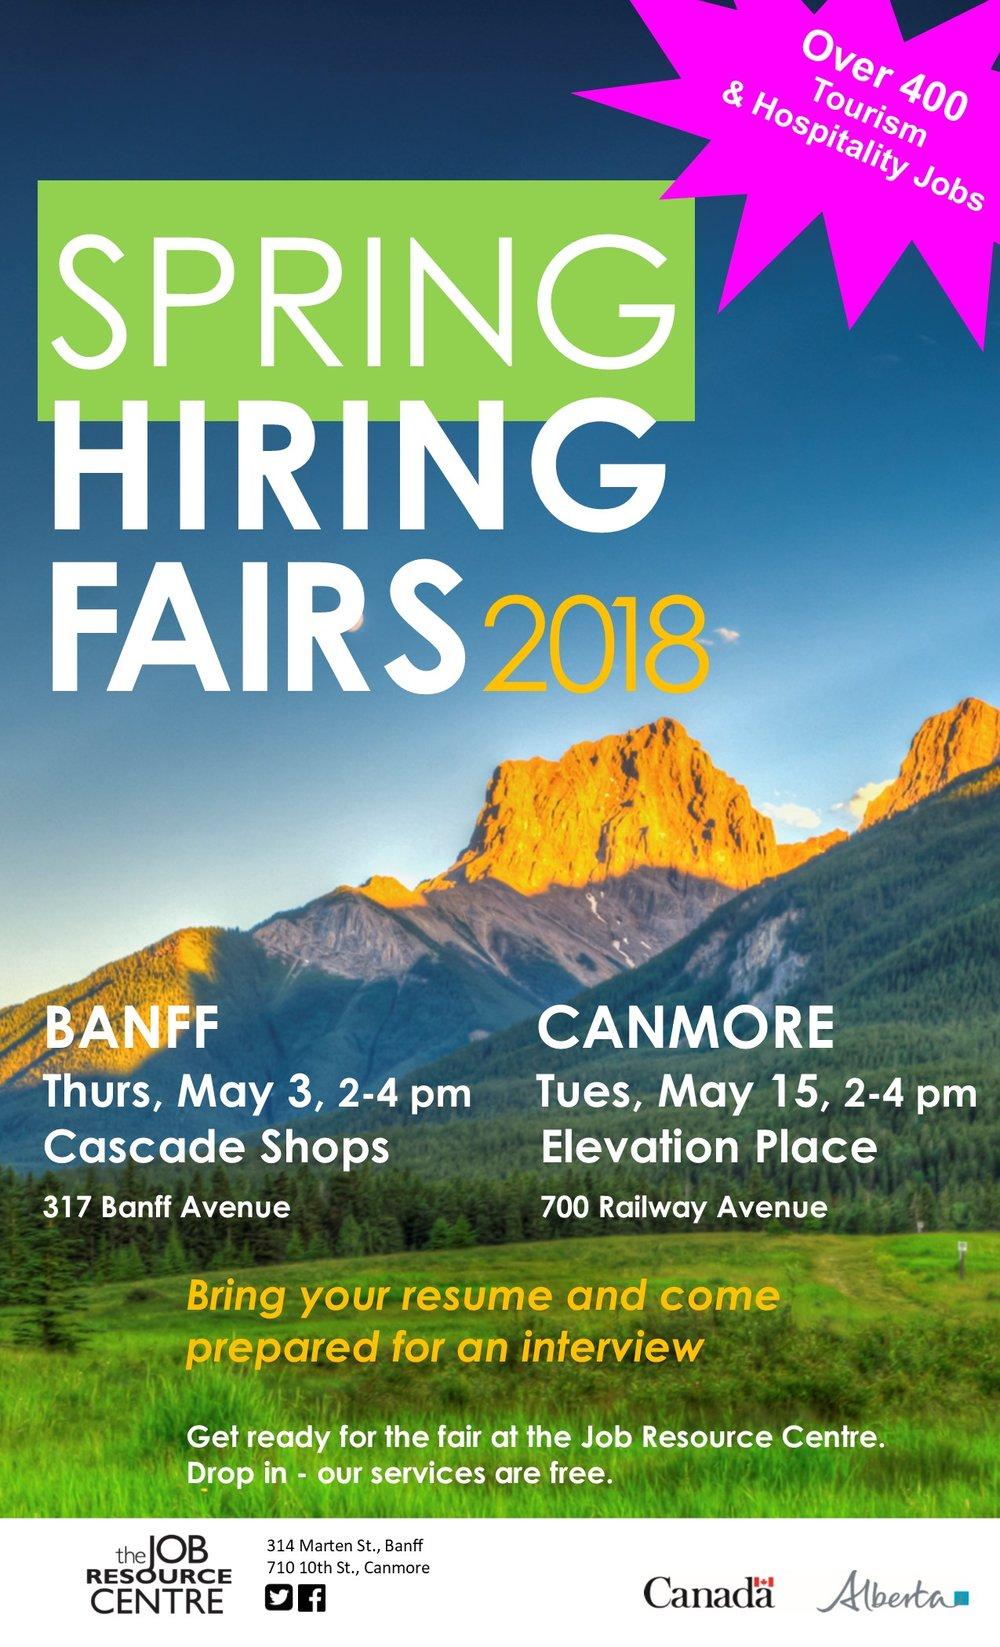 Spring Hiring Fairs 2018 poster.jpg